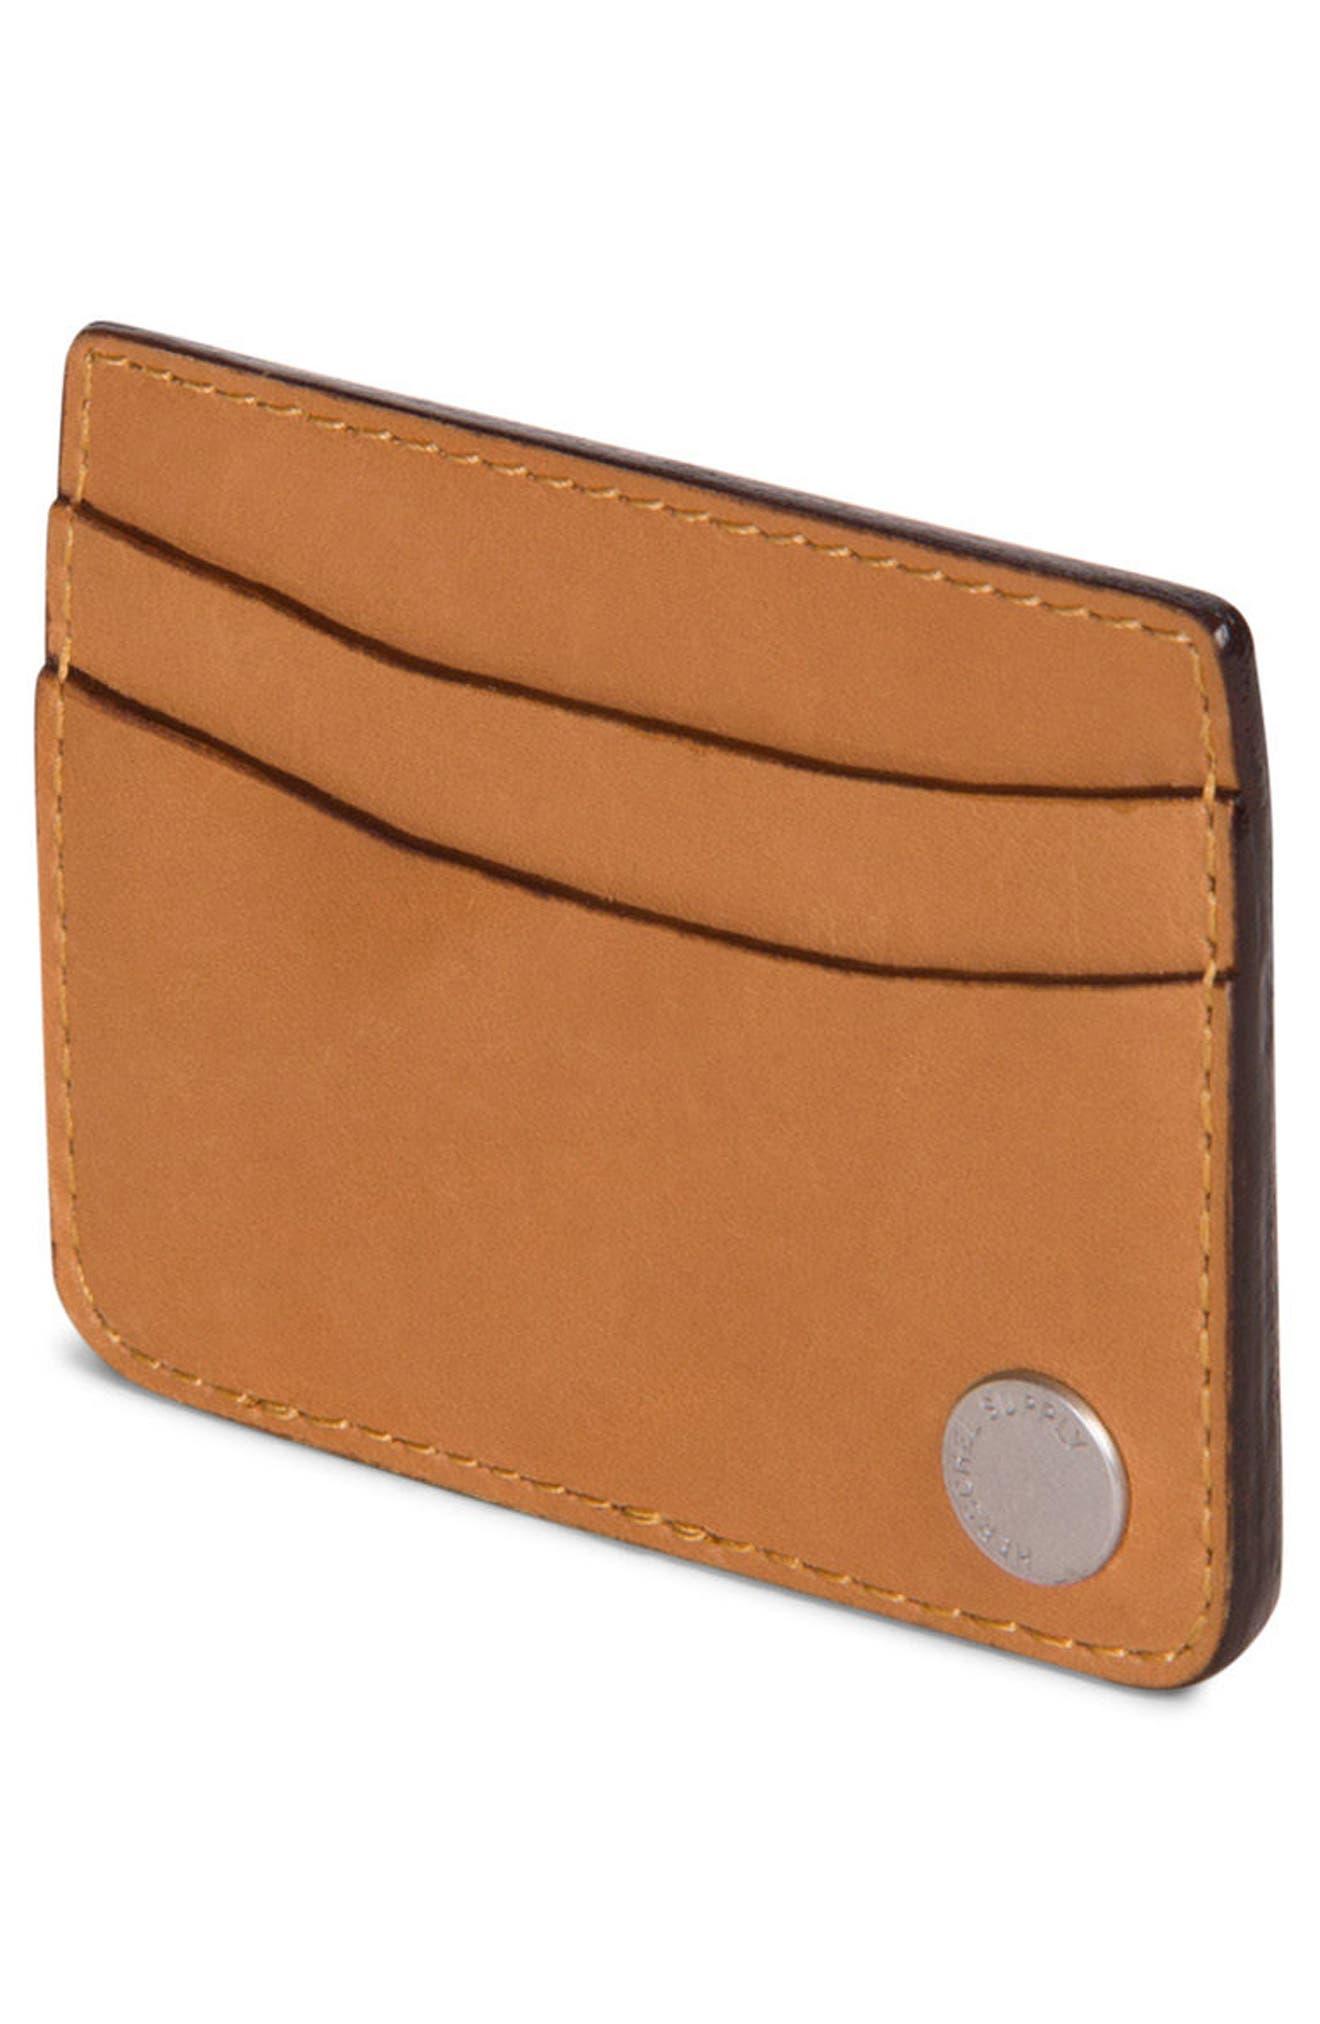 Ace Leather Card Case,                             Alternate thumbnail 2, color,                             Tan